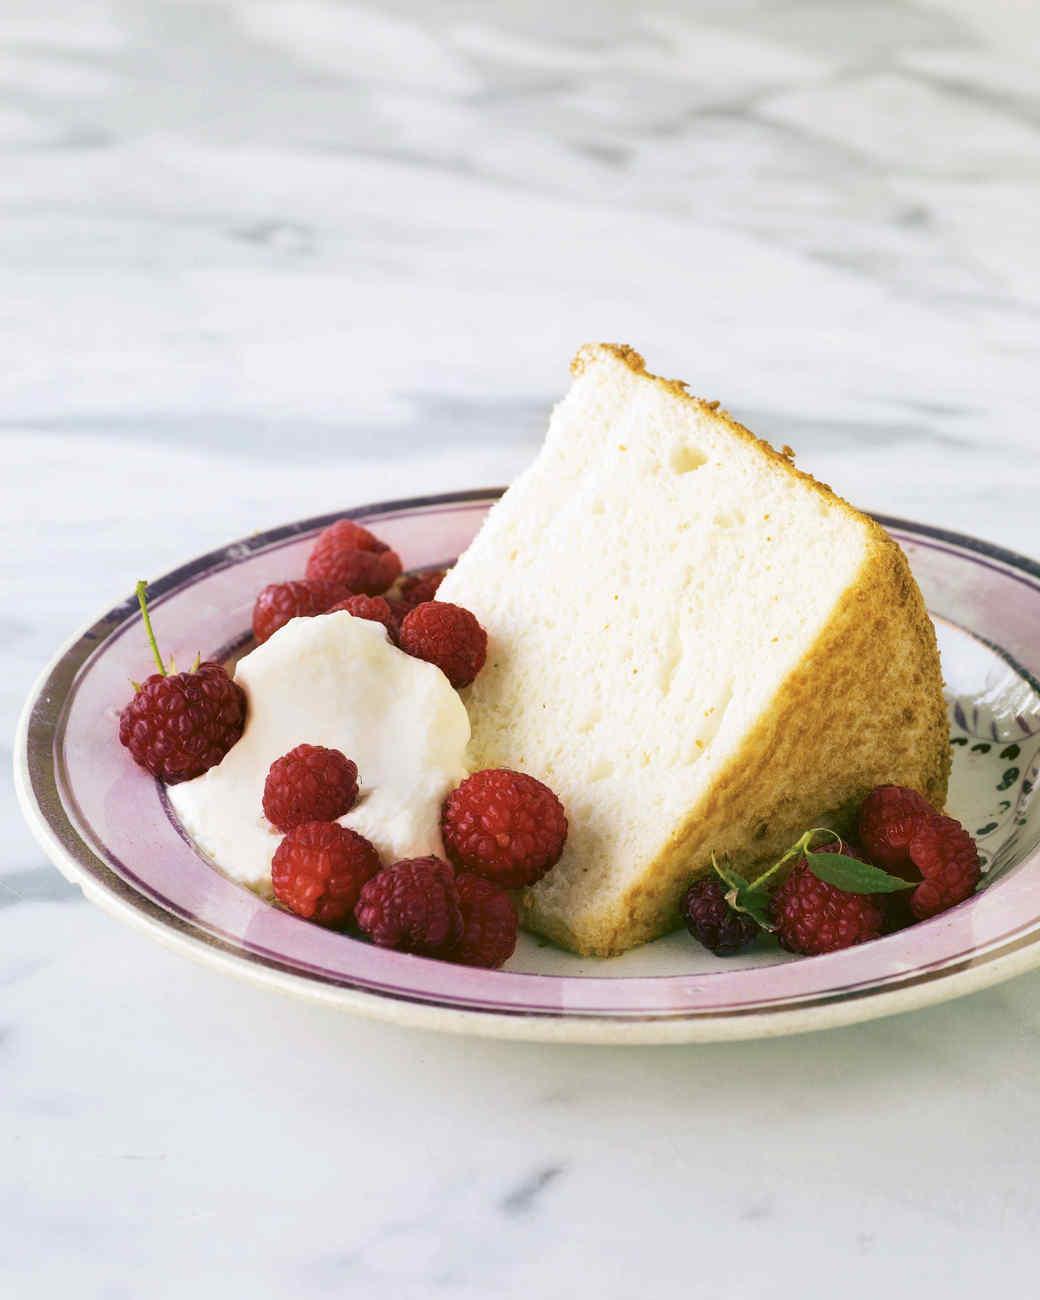 mb_1006_angel_food_cake.jpg